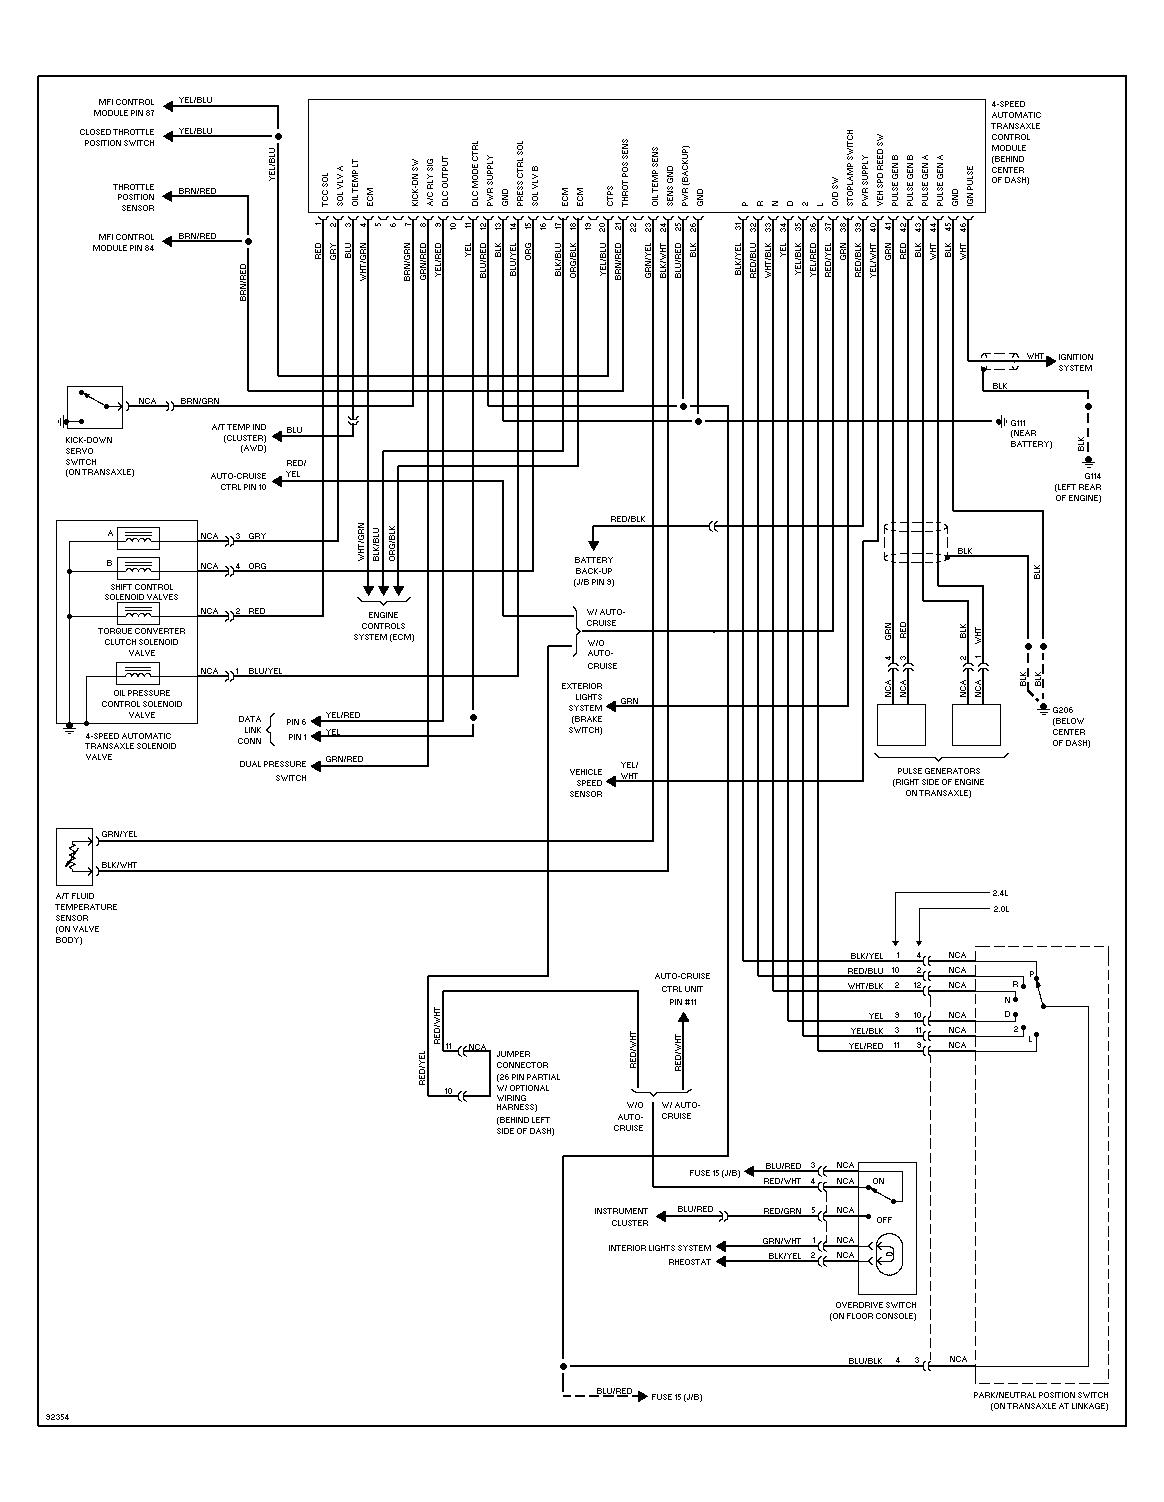 2001 mitsubishi eclipse wiring diagram 1999 mitsubishi eclipse engine diagram fresh od switch missing 2002 dodge ram wiring diagram 12a jpg